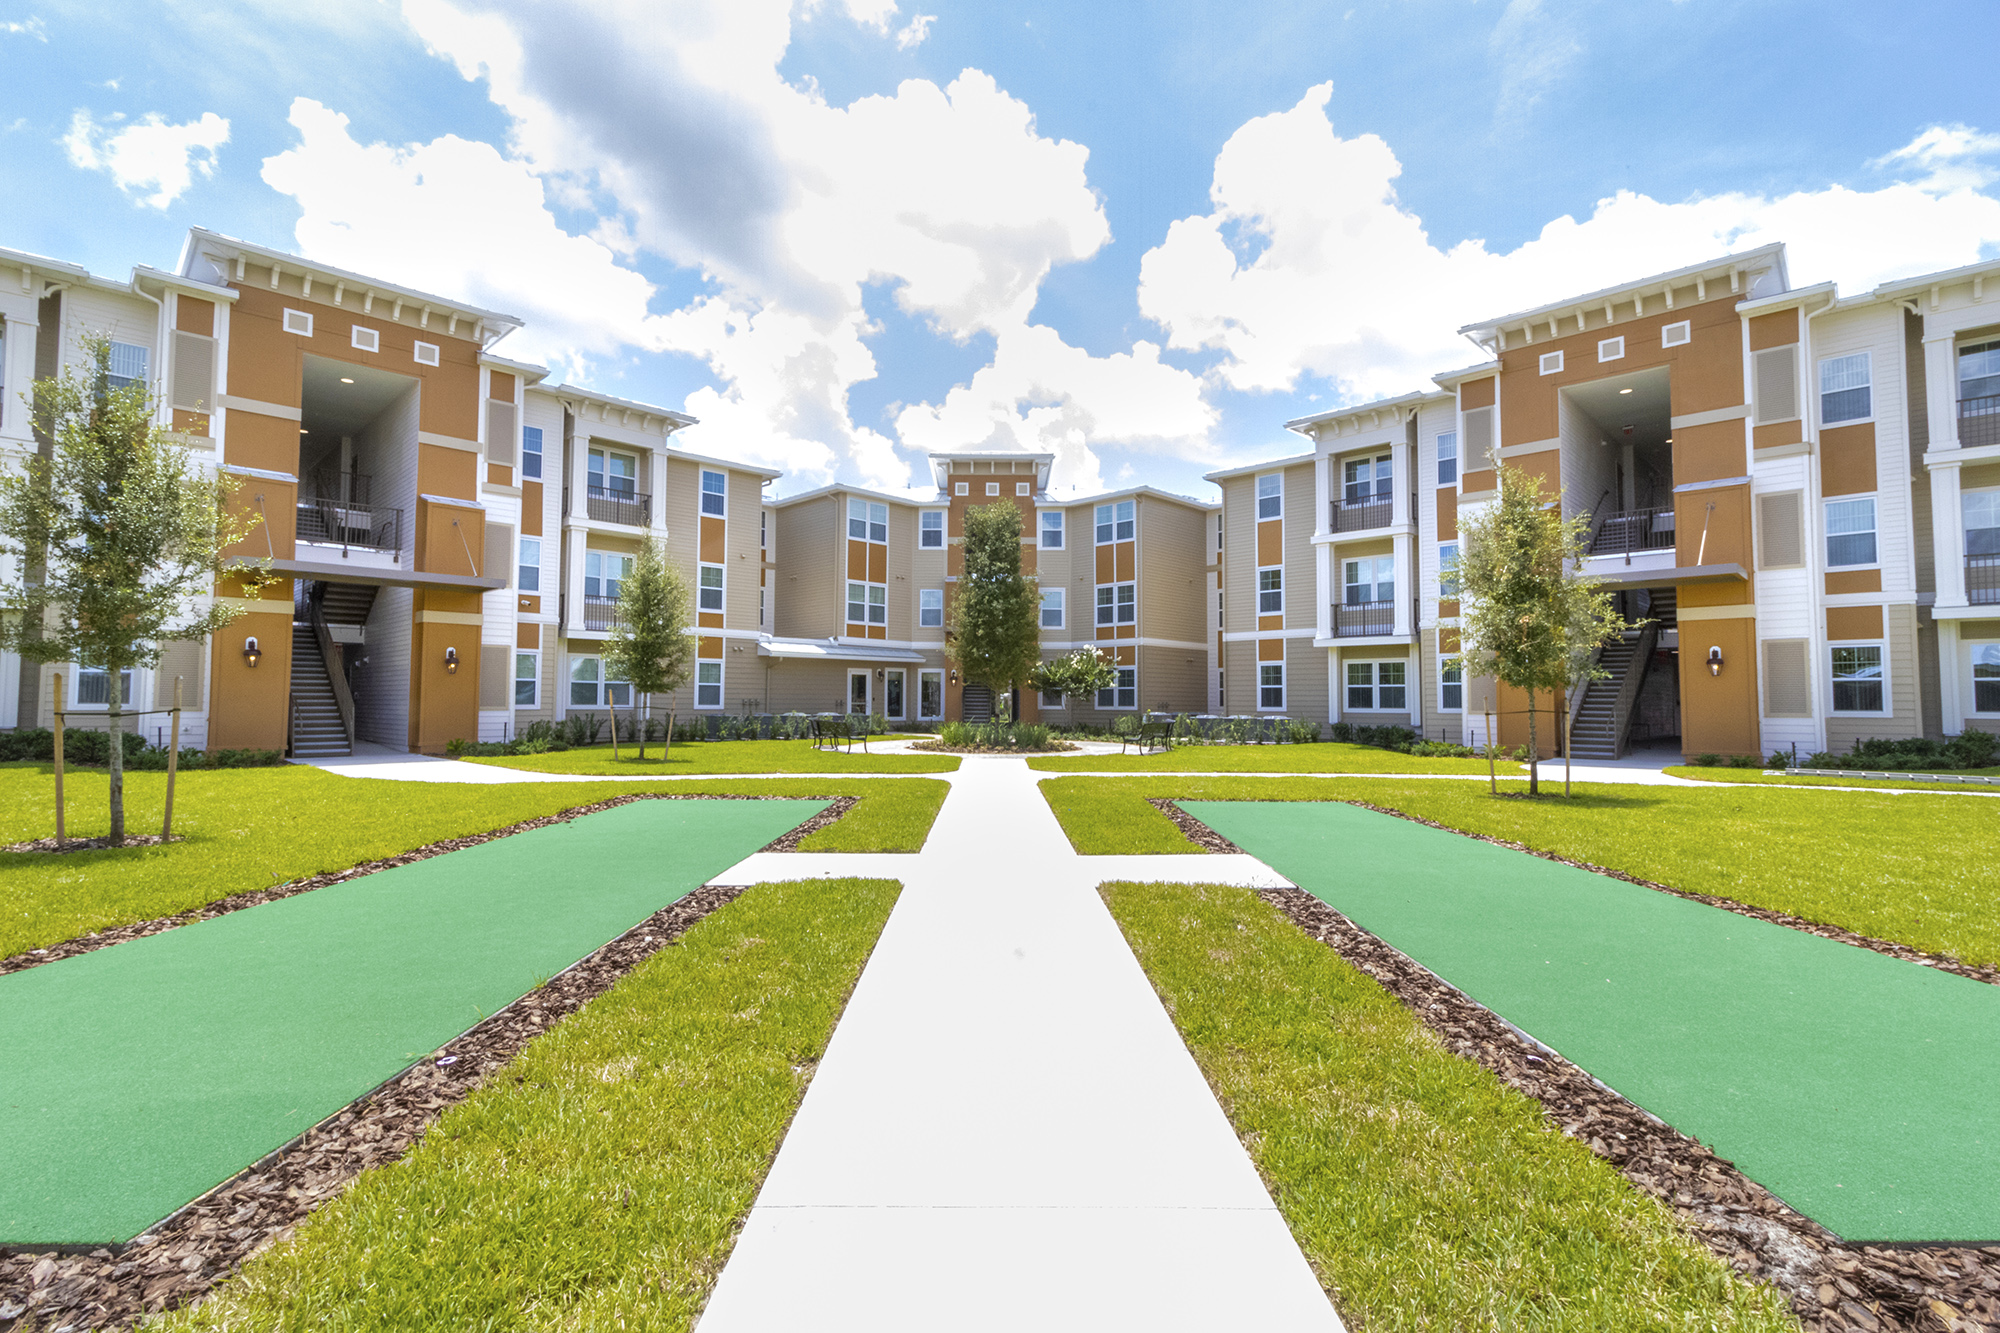 Building exterior,Building exterior